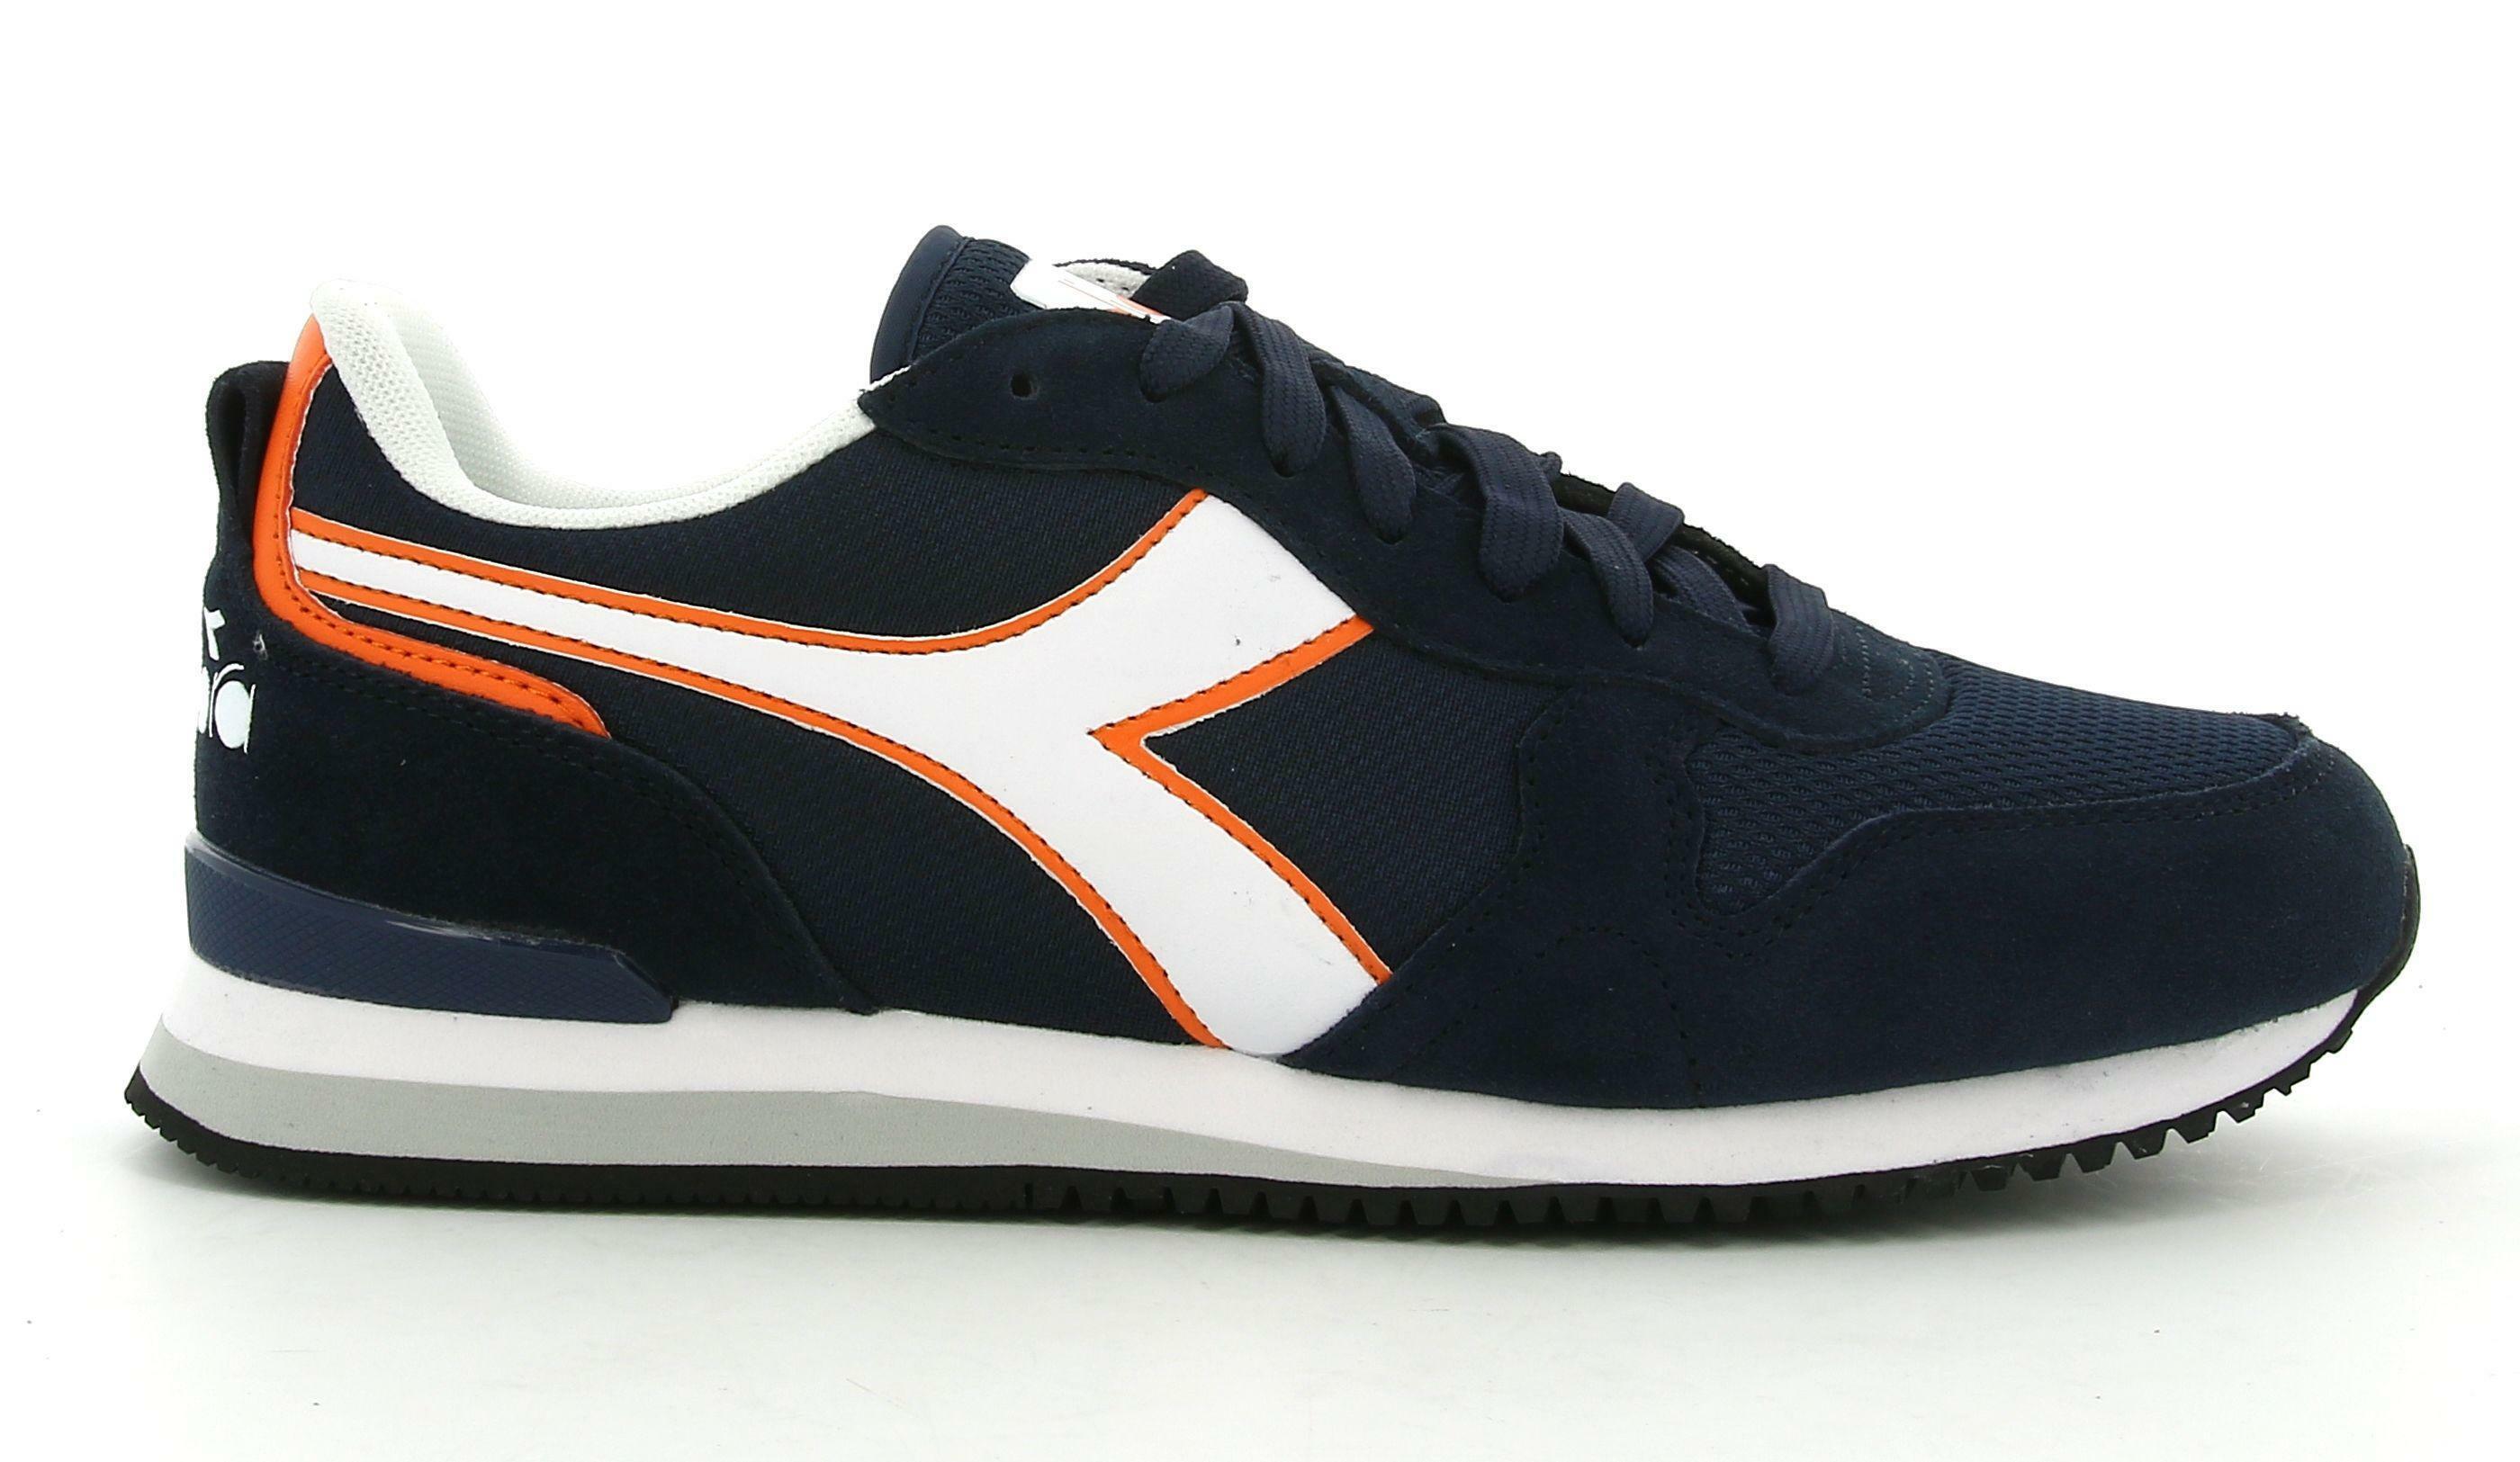 diadora diadora olympia 174376 scarpa sportiva uomo blu